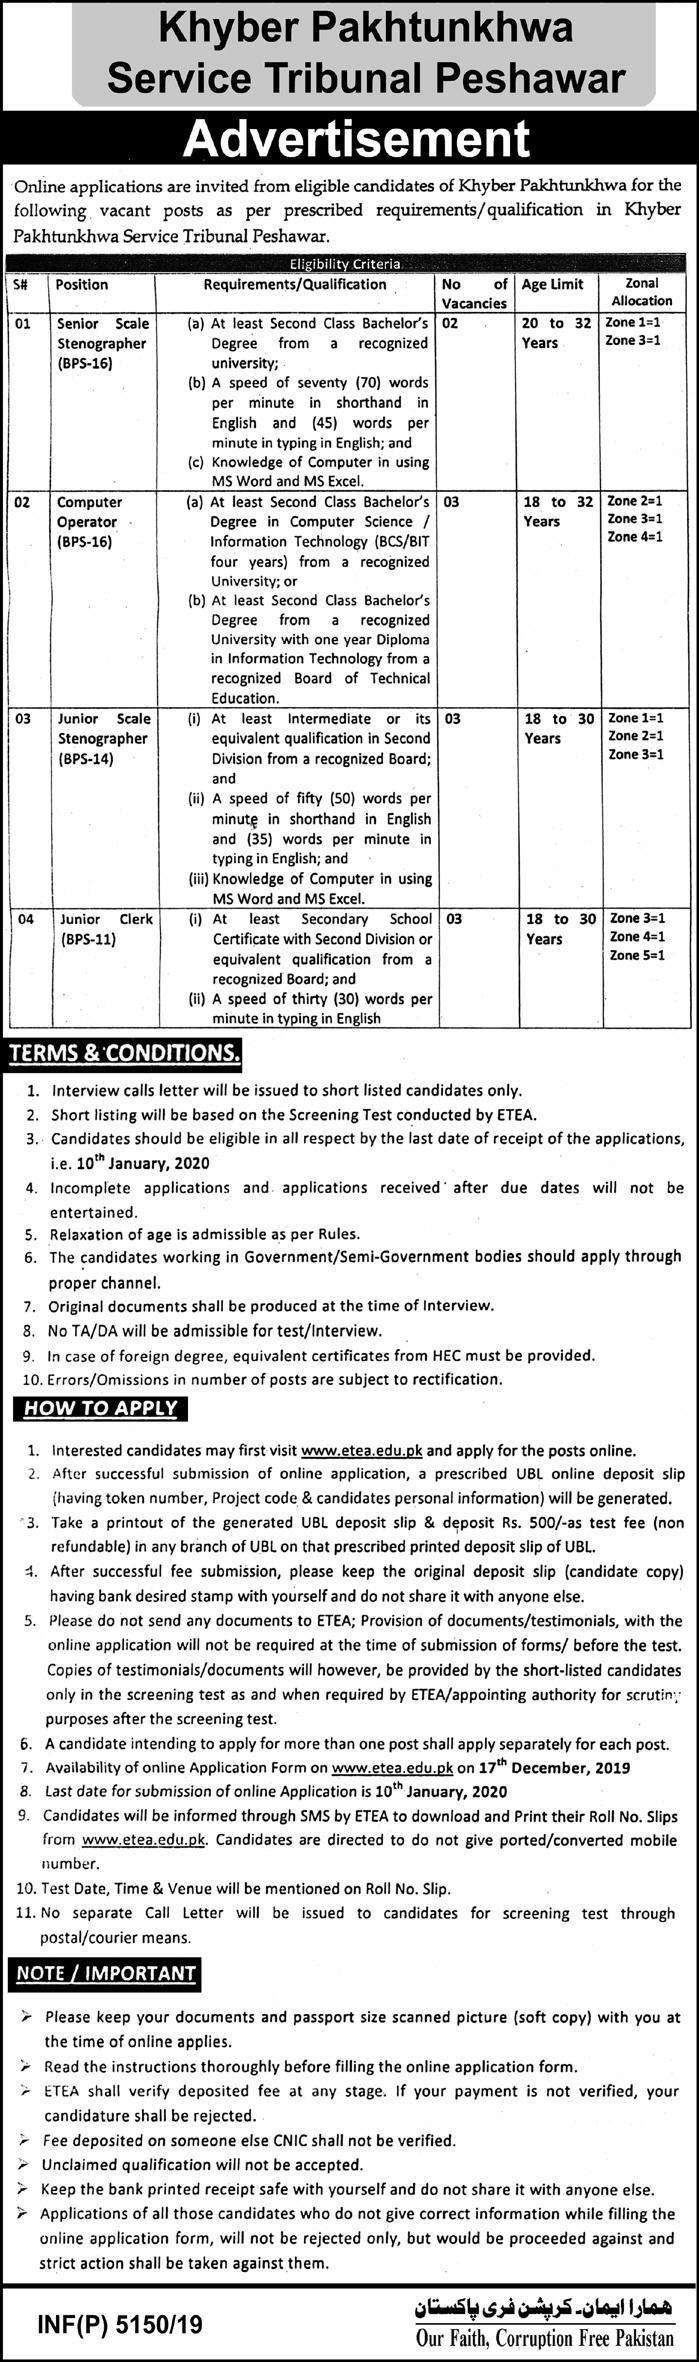 KPK Service Tribunal Peshawar KPST Jobs Via ETEA